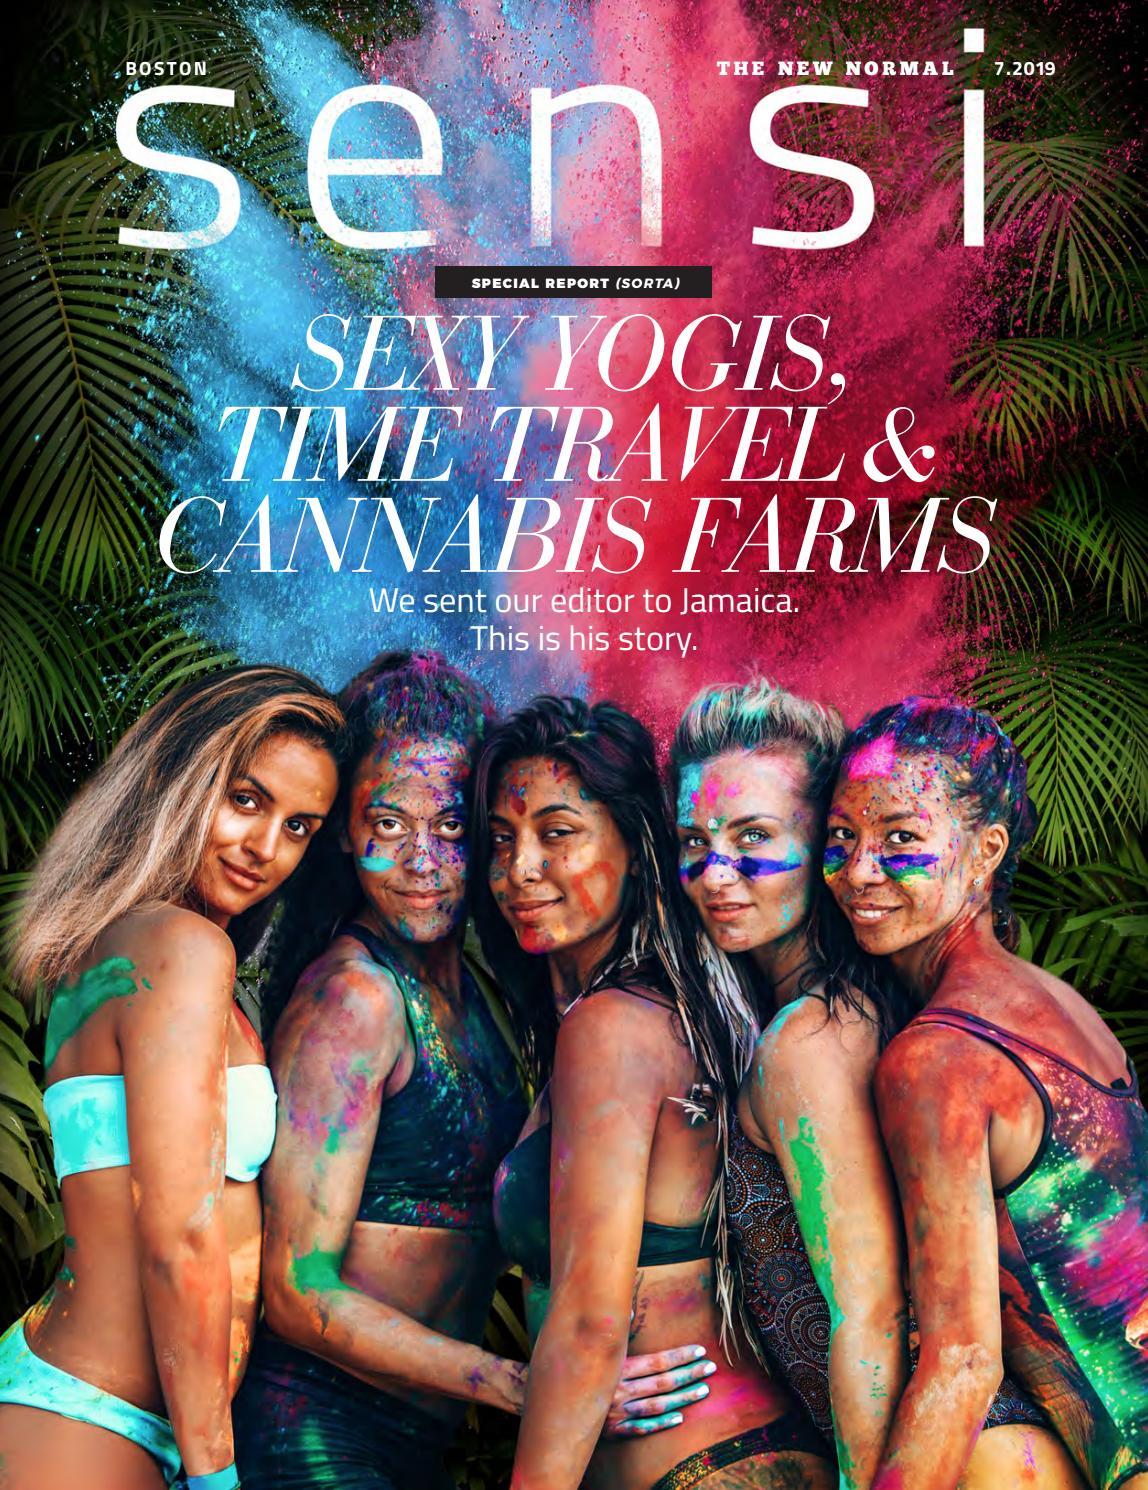 Bikini Royale Trailer sensi magazine - boston (july 2019)sensi media group